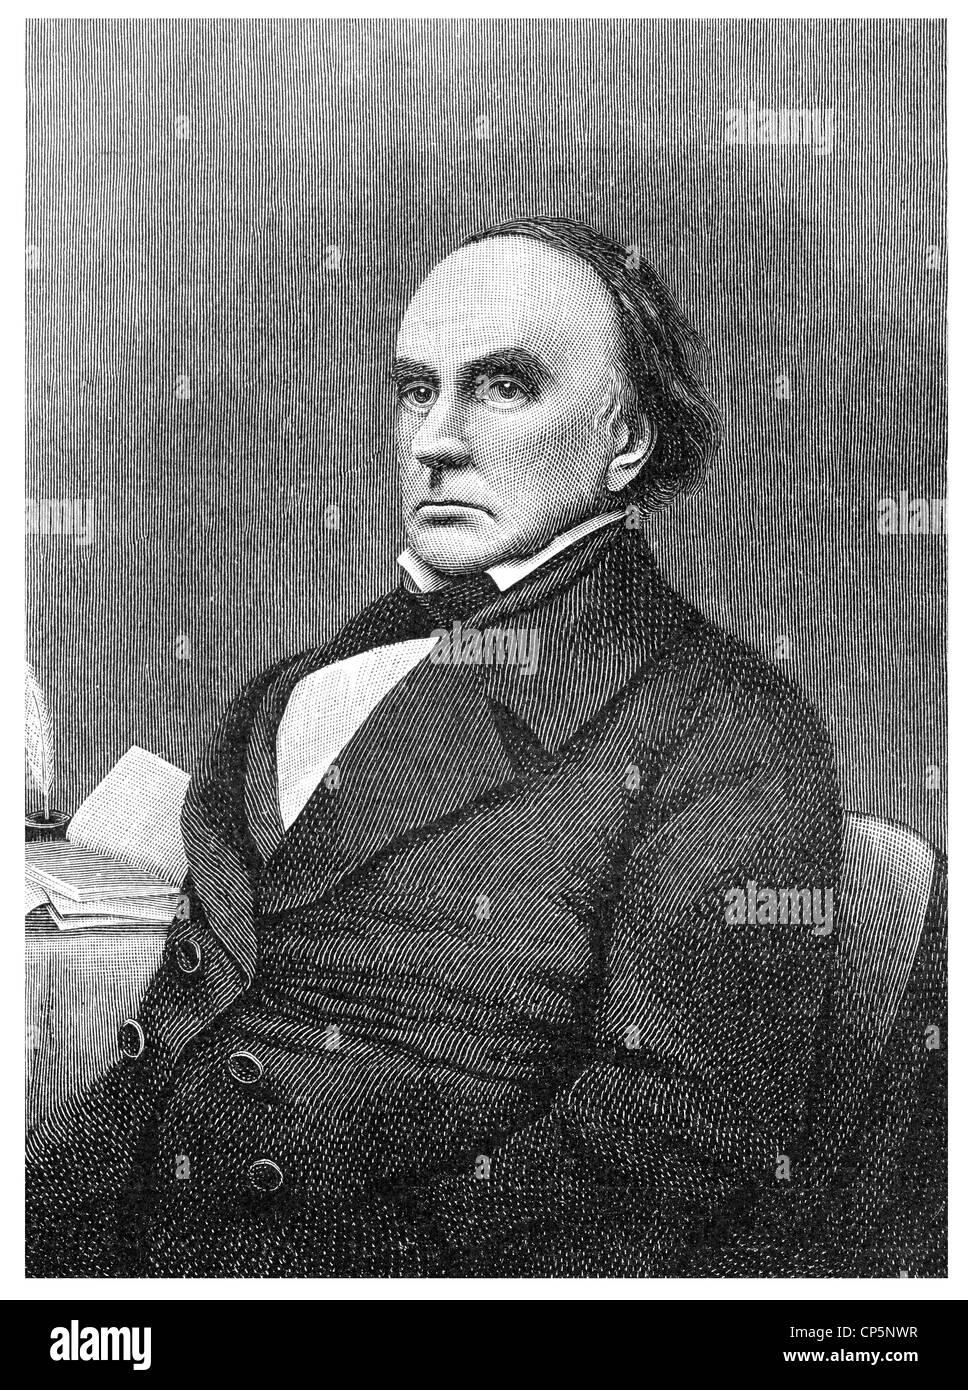 Daniel Webster, 1782 - 1852, an American statesman and jurist, - Stock Image